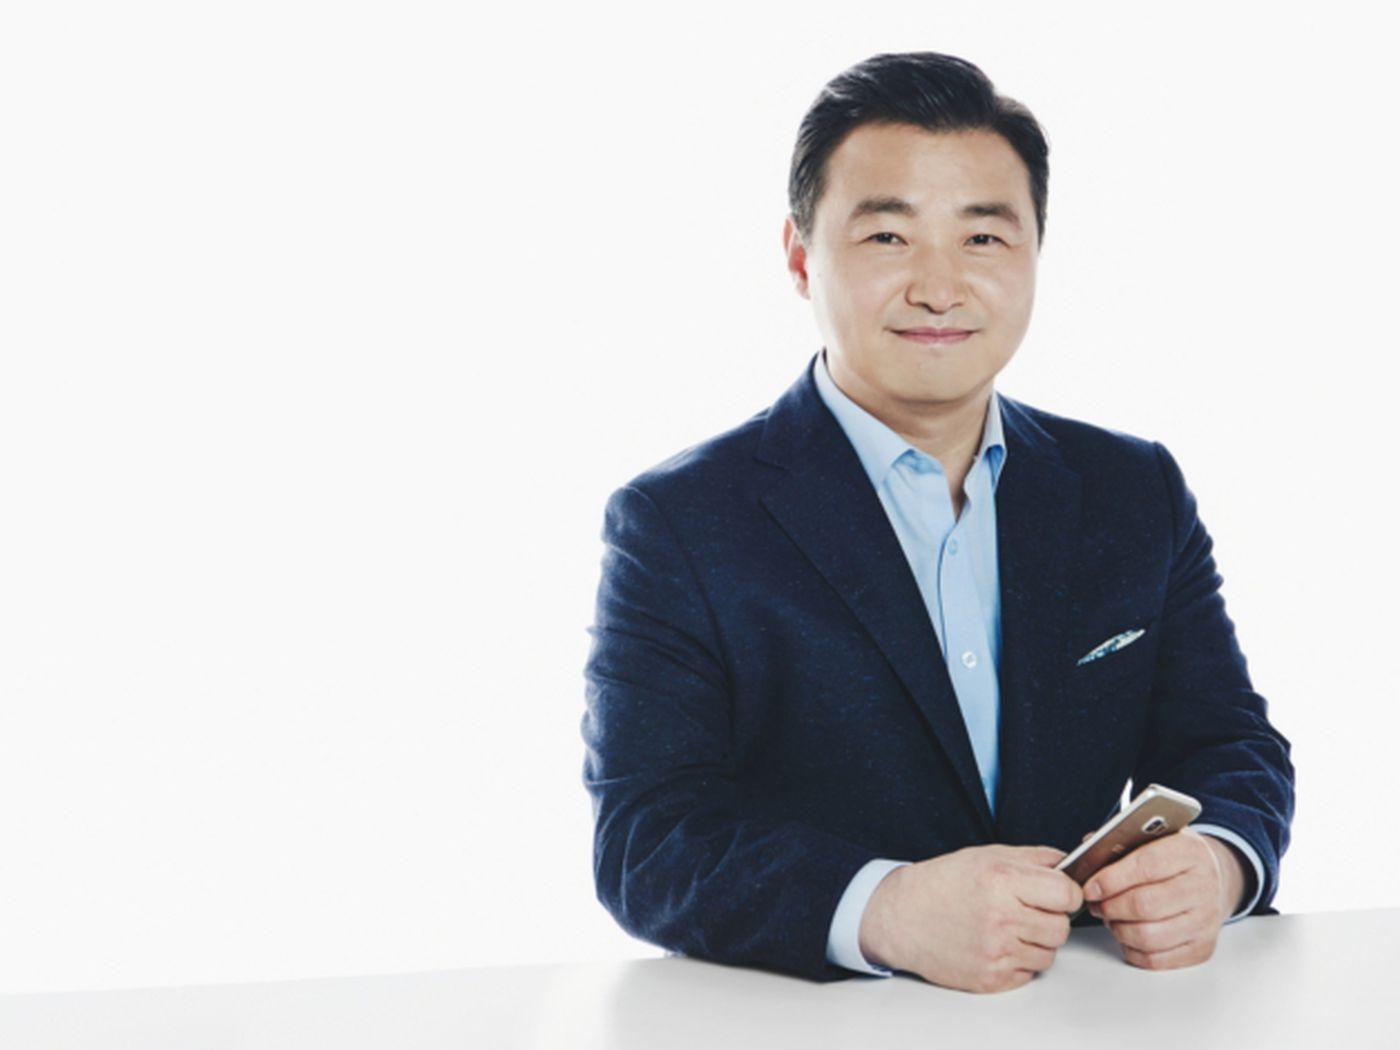 Samsung names Roh Tae-moon new smartphone boss - The Verge